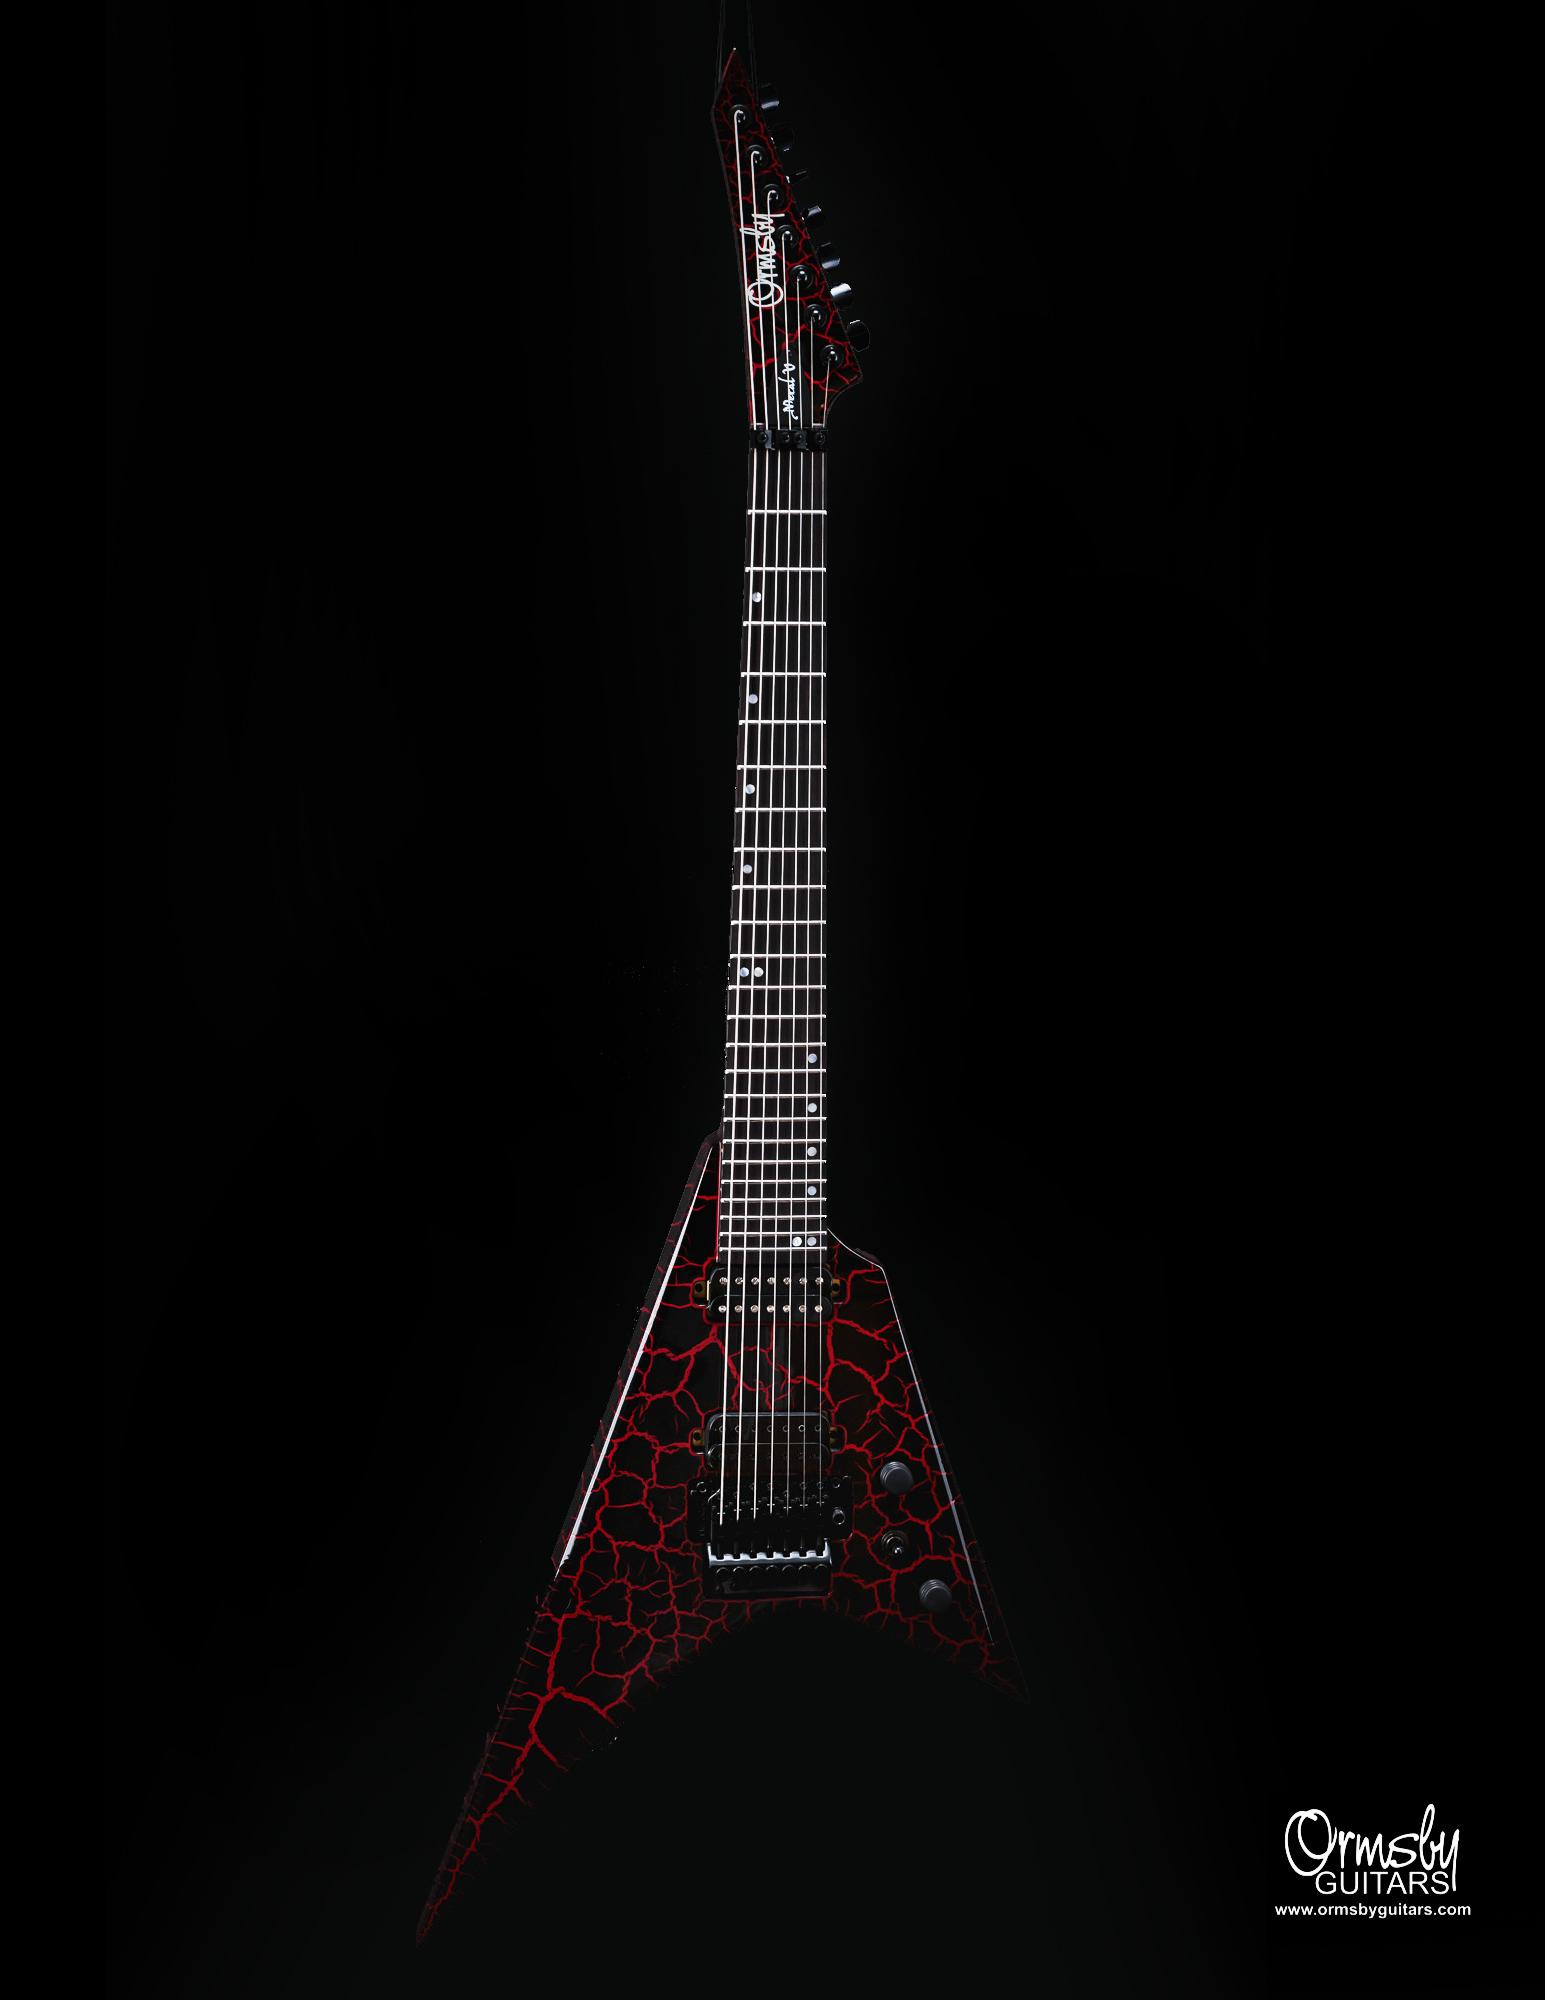 Ormsby Guitars Run 11 Metal V Crackle